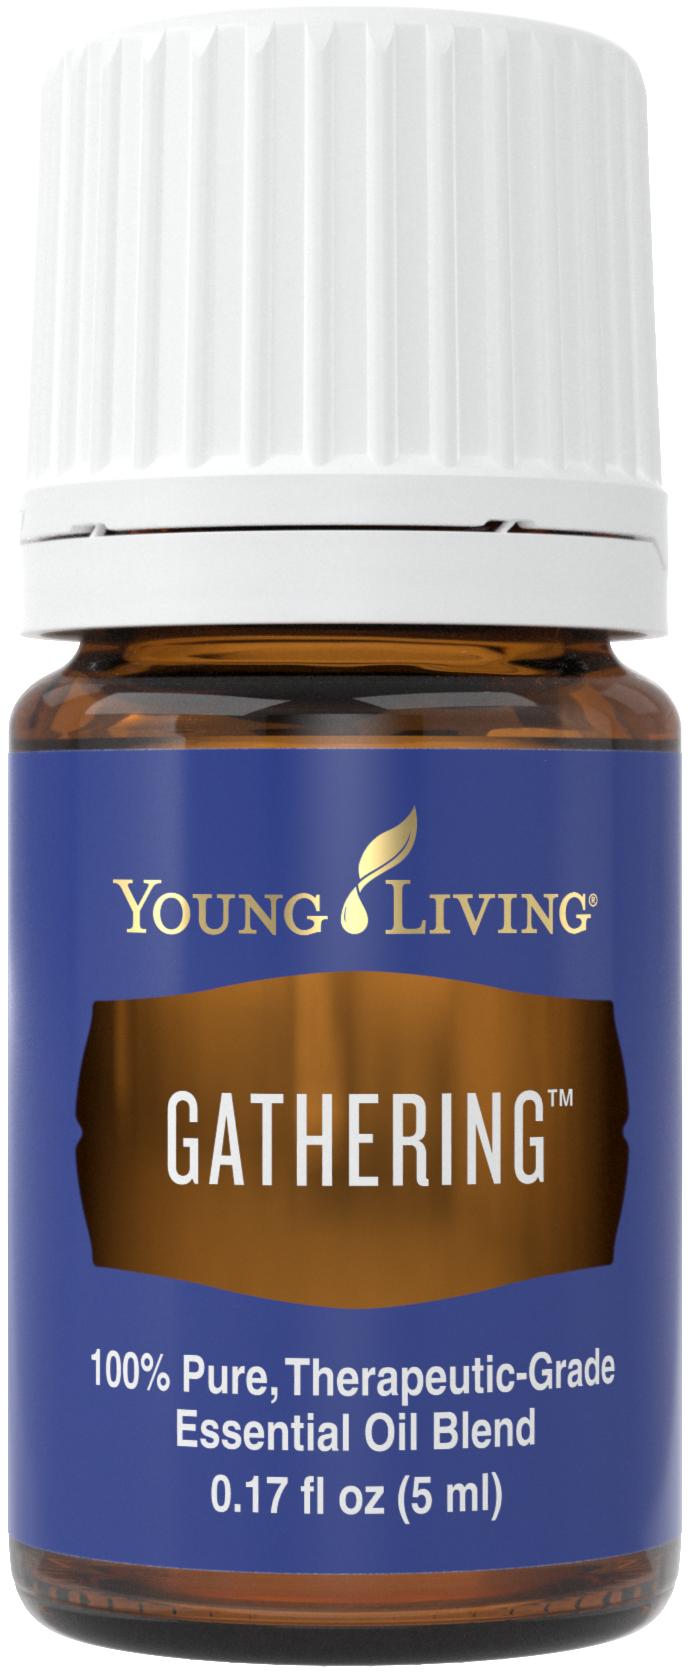 gathering_5ml_silo_us_2016_24527183245_o